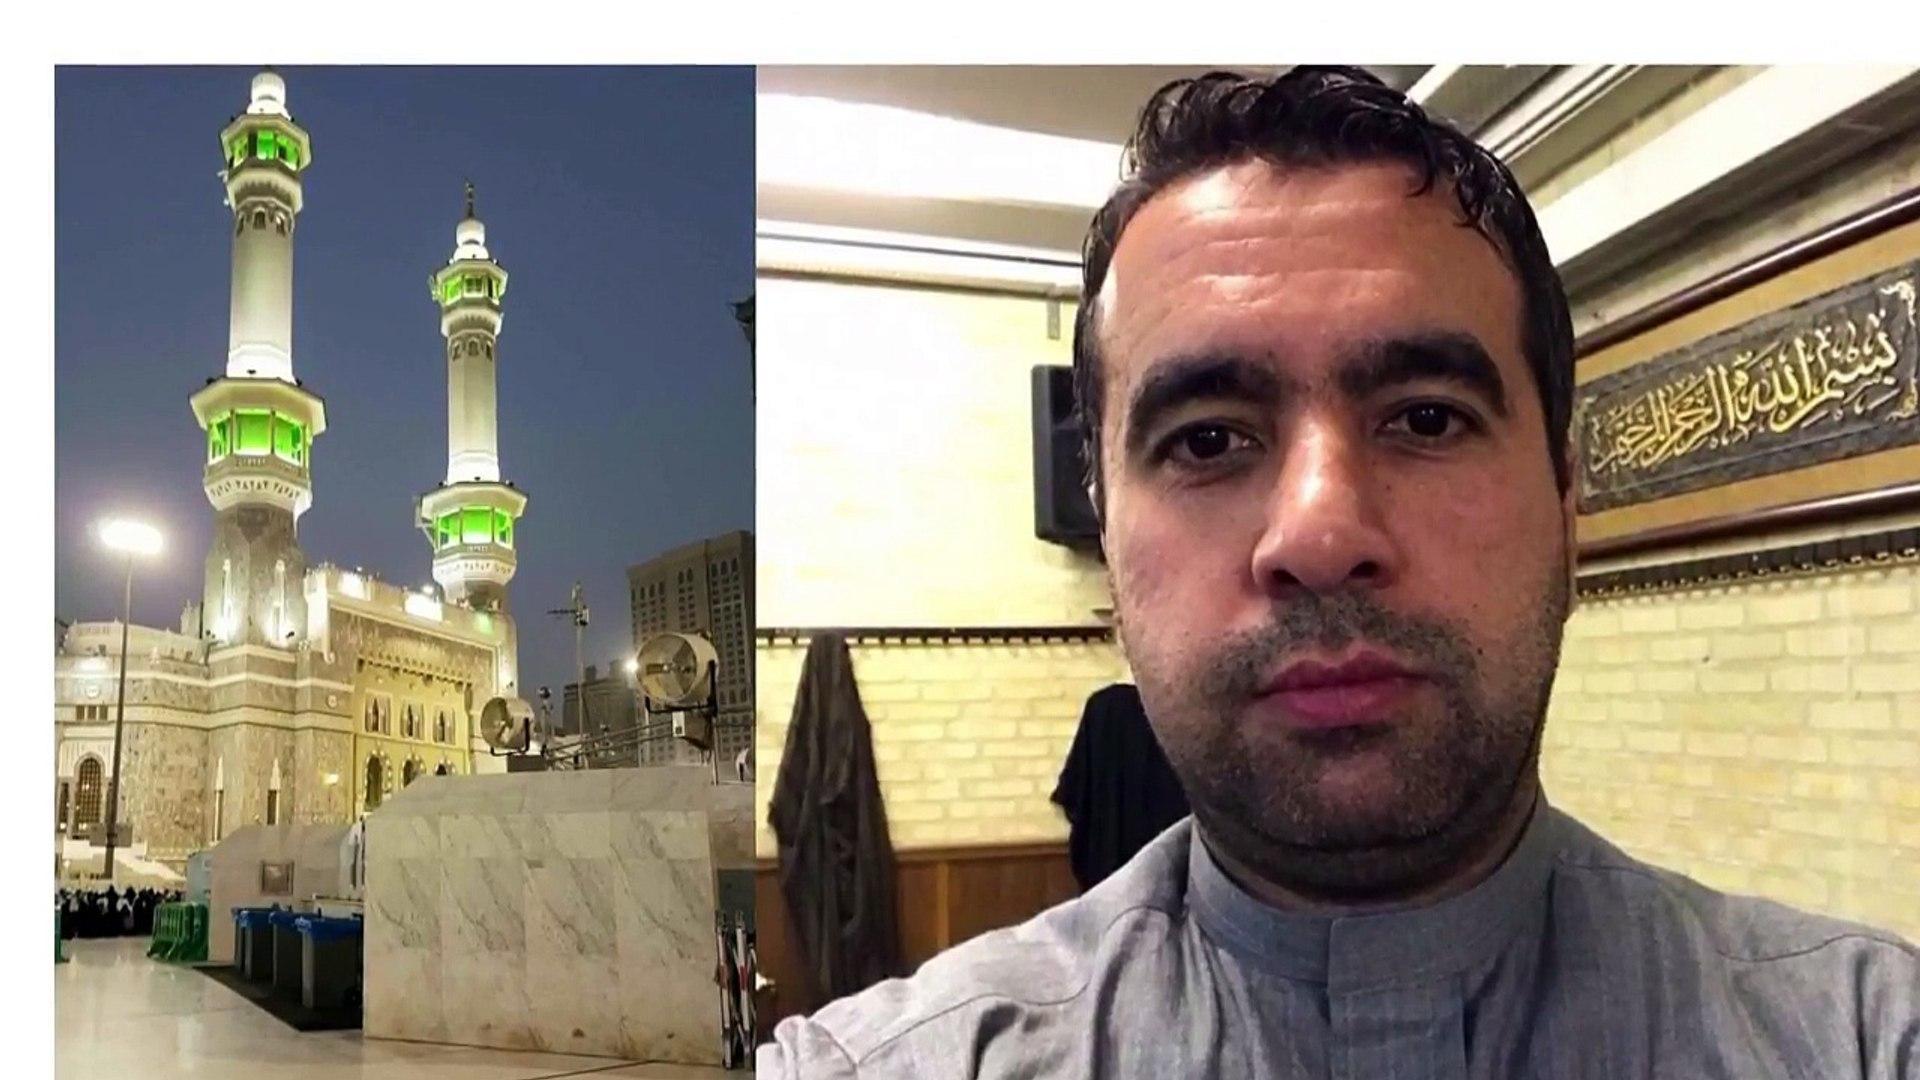 Adhaan Makkah. Müthiş Ezan - Kabe ezanı. Hafız Metin Demirtaş. Adhan Makkah Sheikh Ali Mullah. Azan